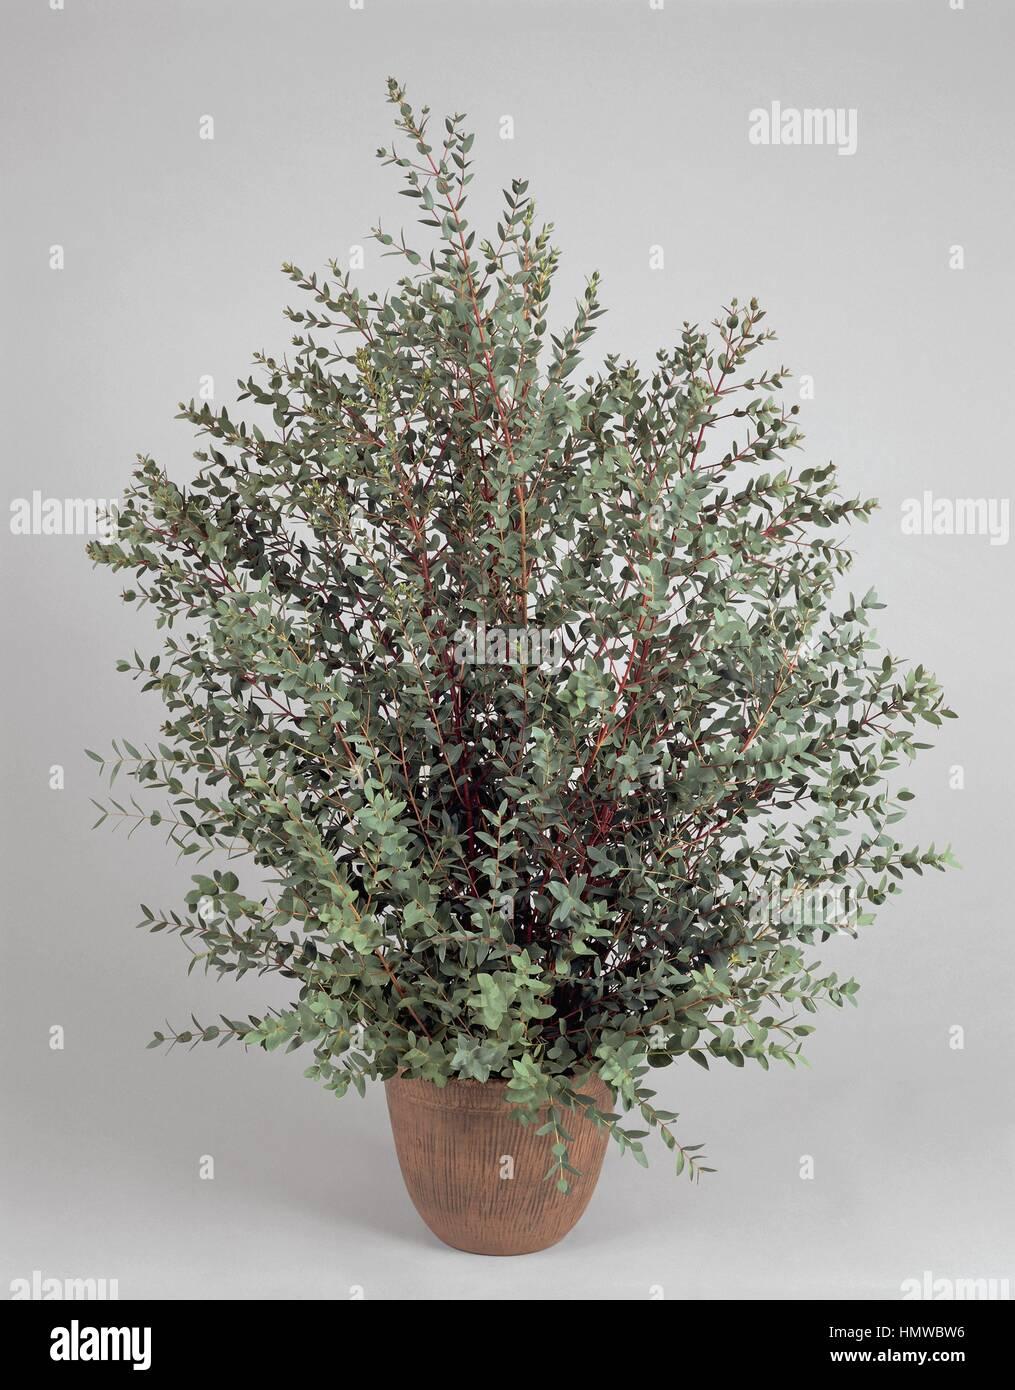 Houseplants - Myrtaceae. Snow gum (Eucalyptus niphophila) - Stock Image